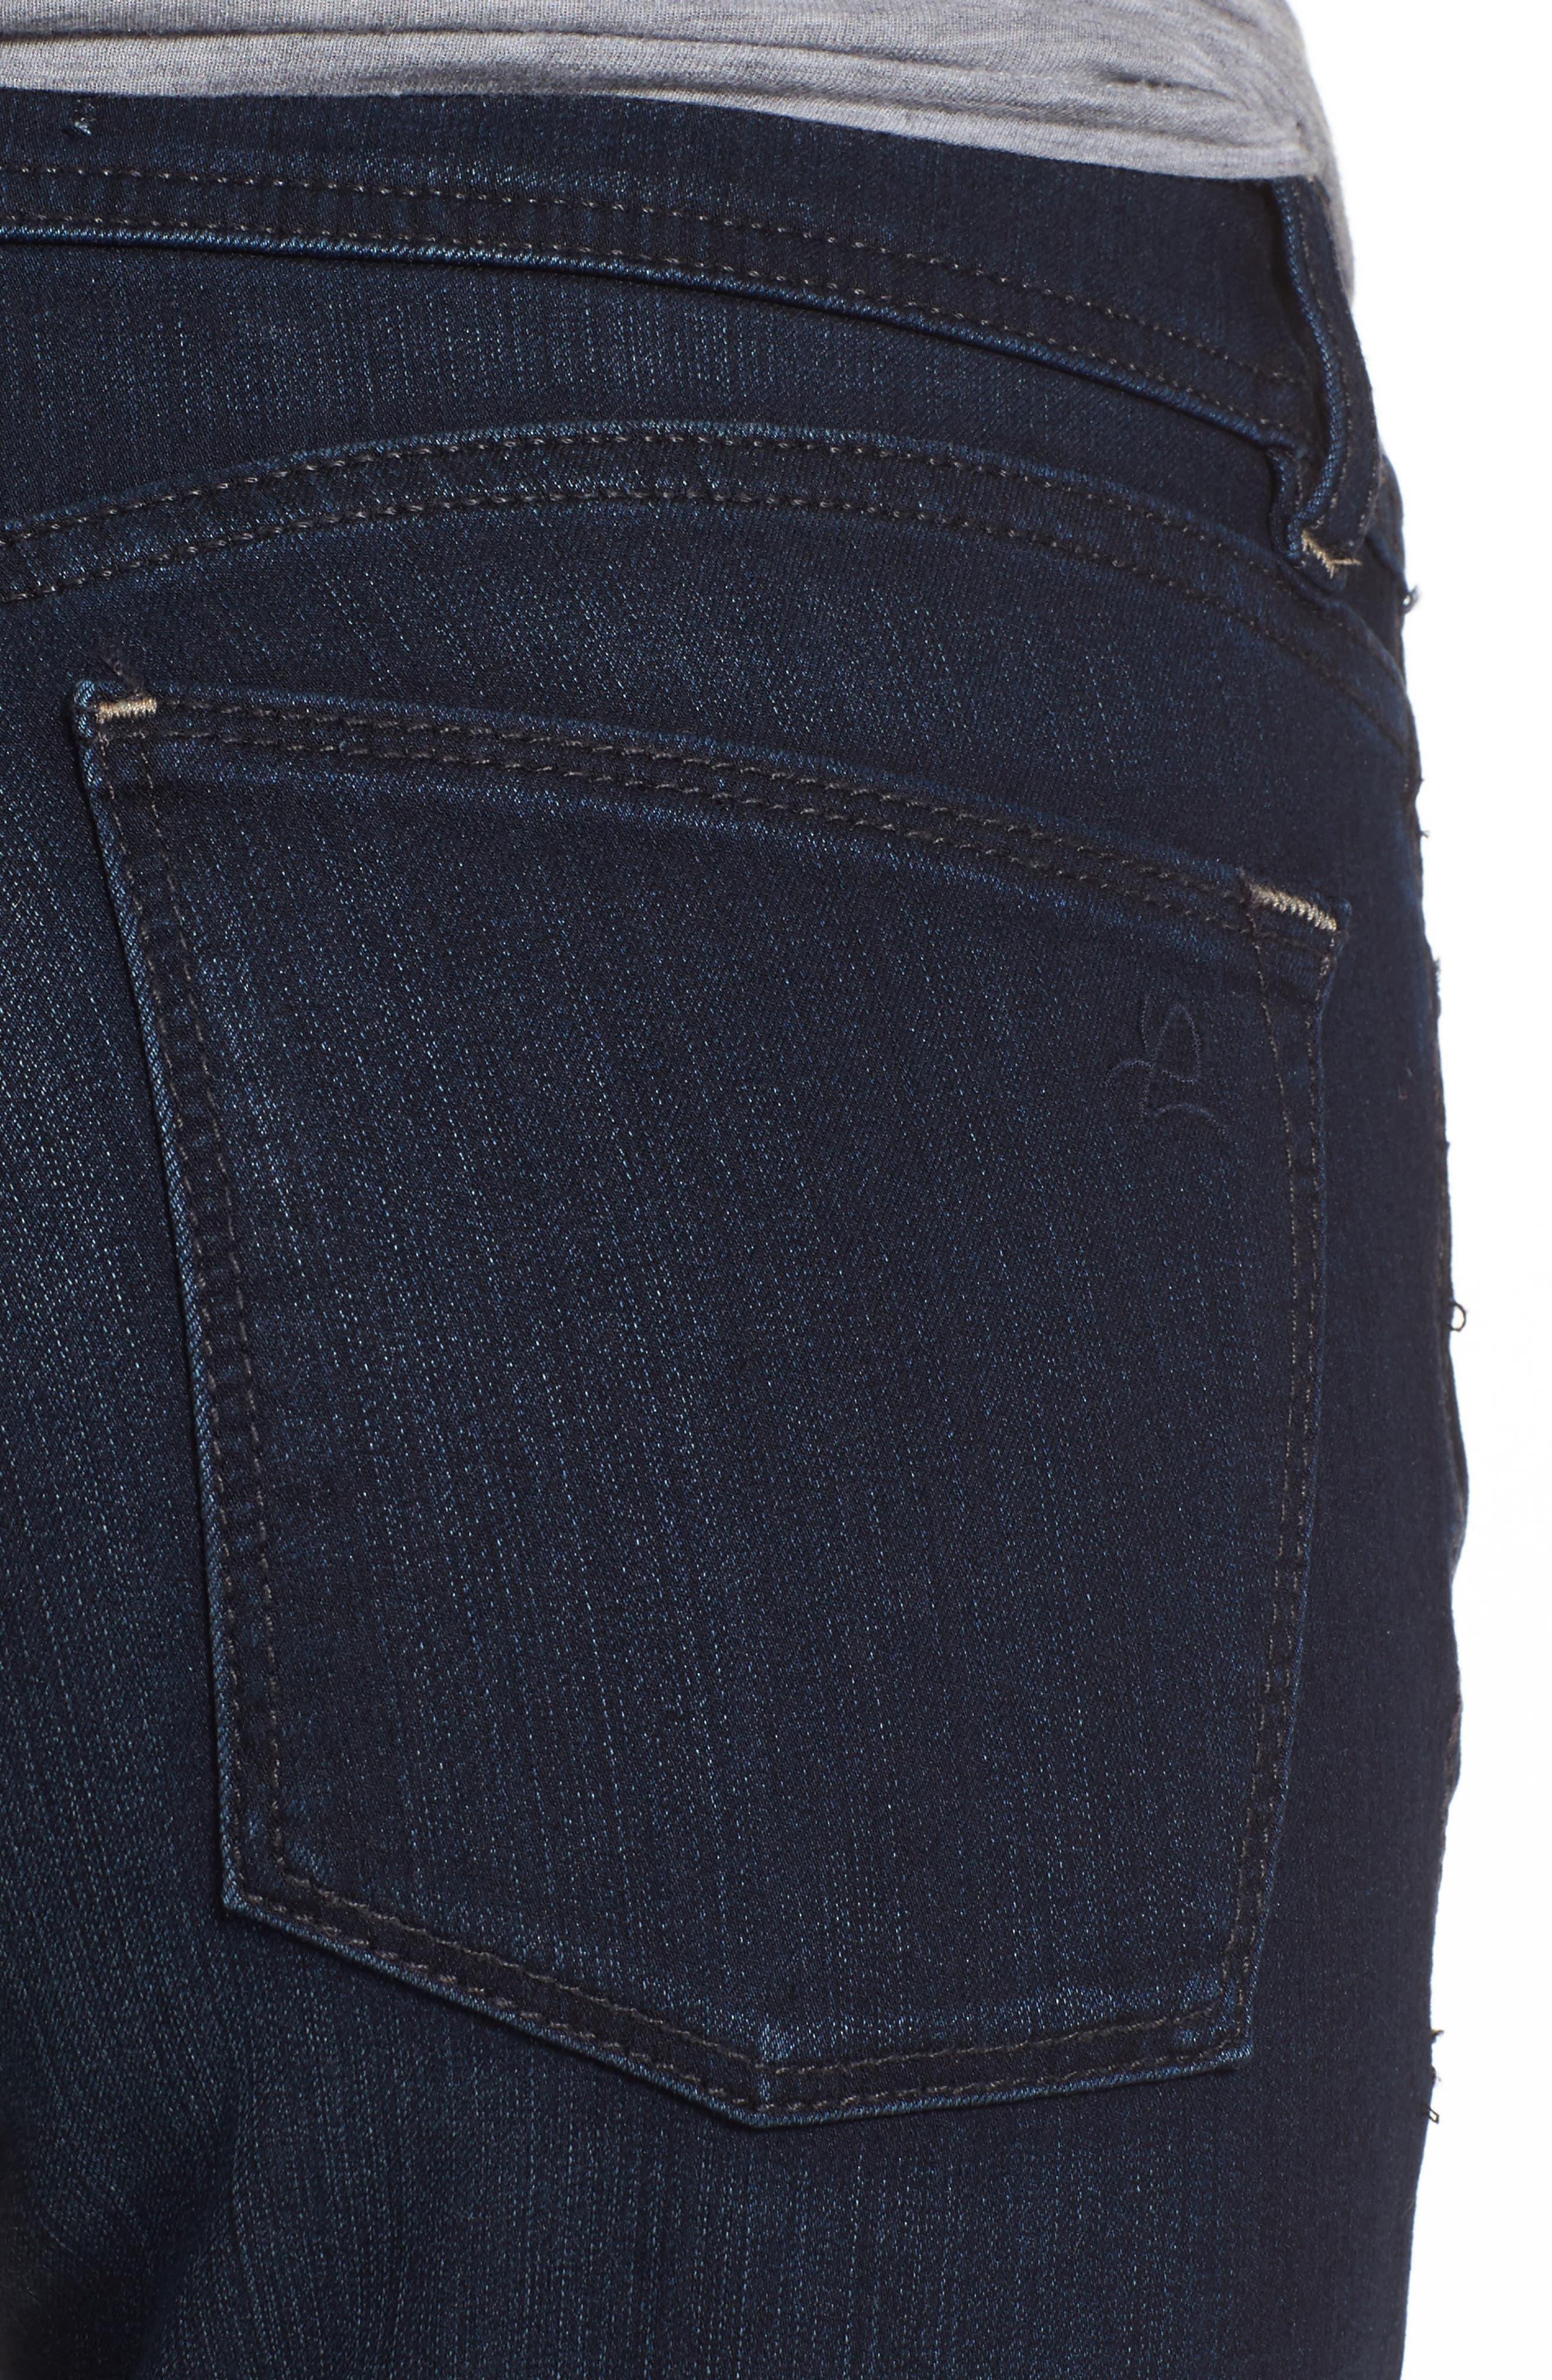 'Grace' Straight Jeans,                             Alternate thumbnail 4, color,                             405